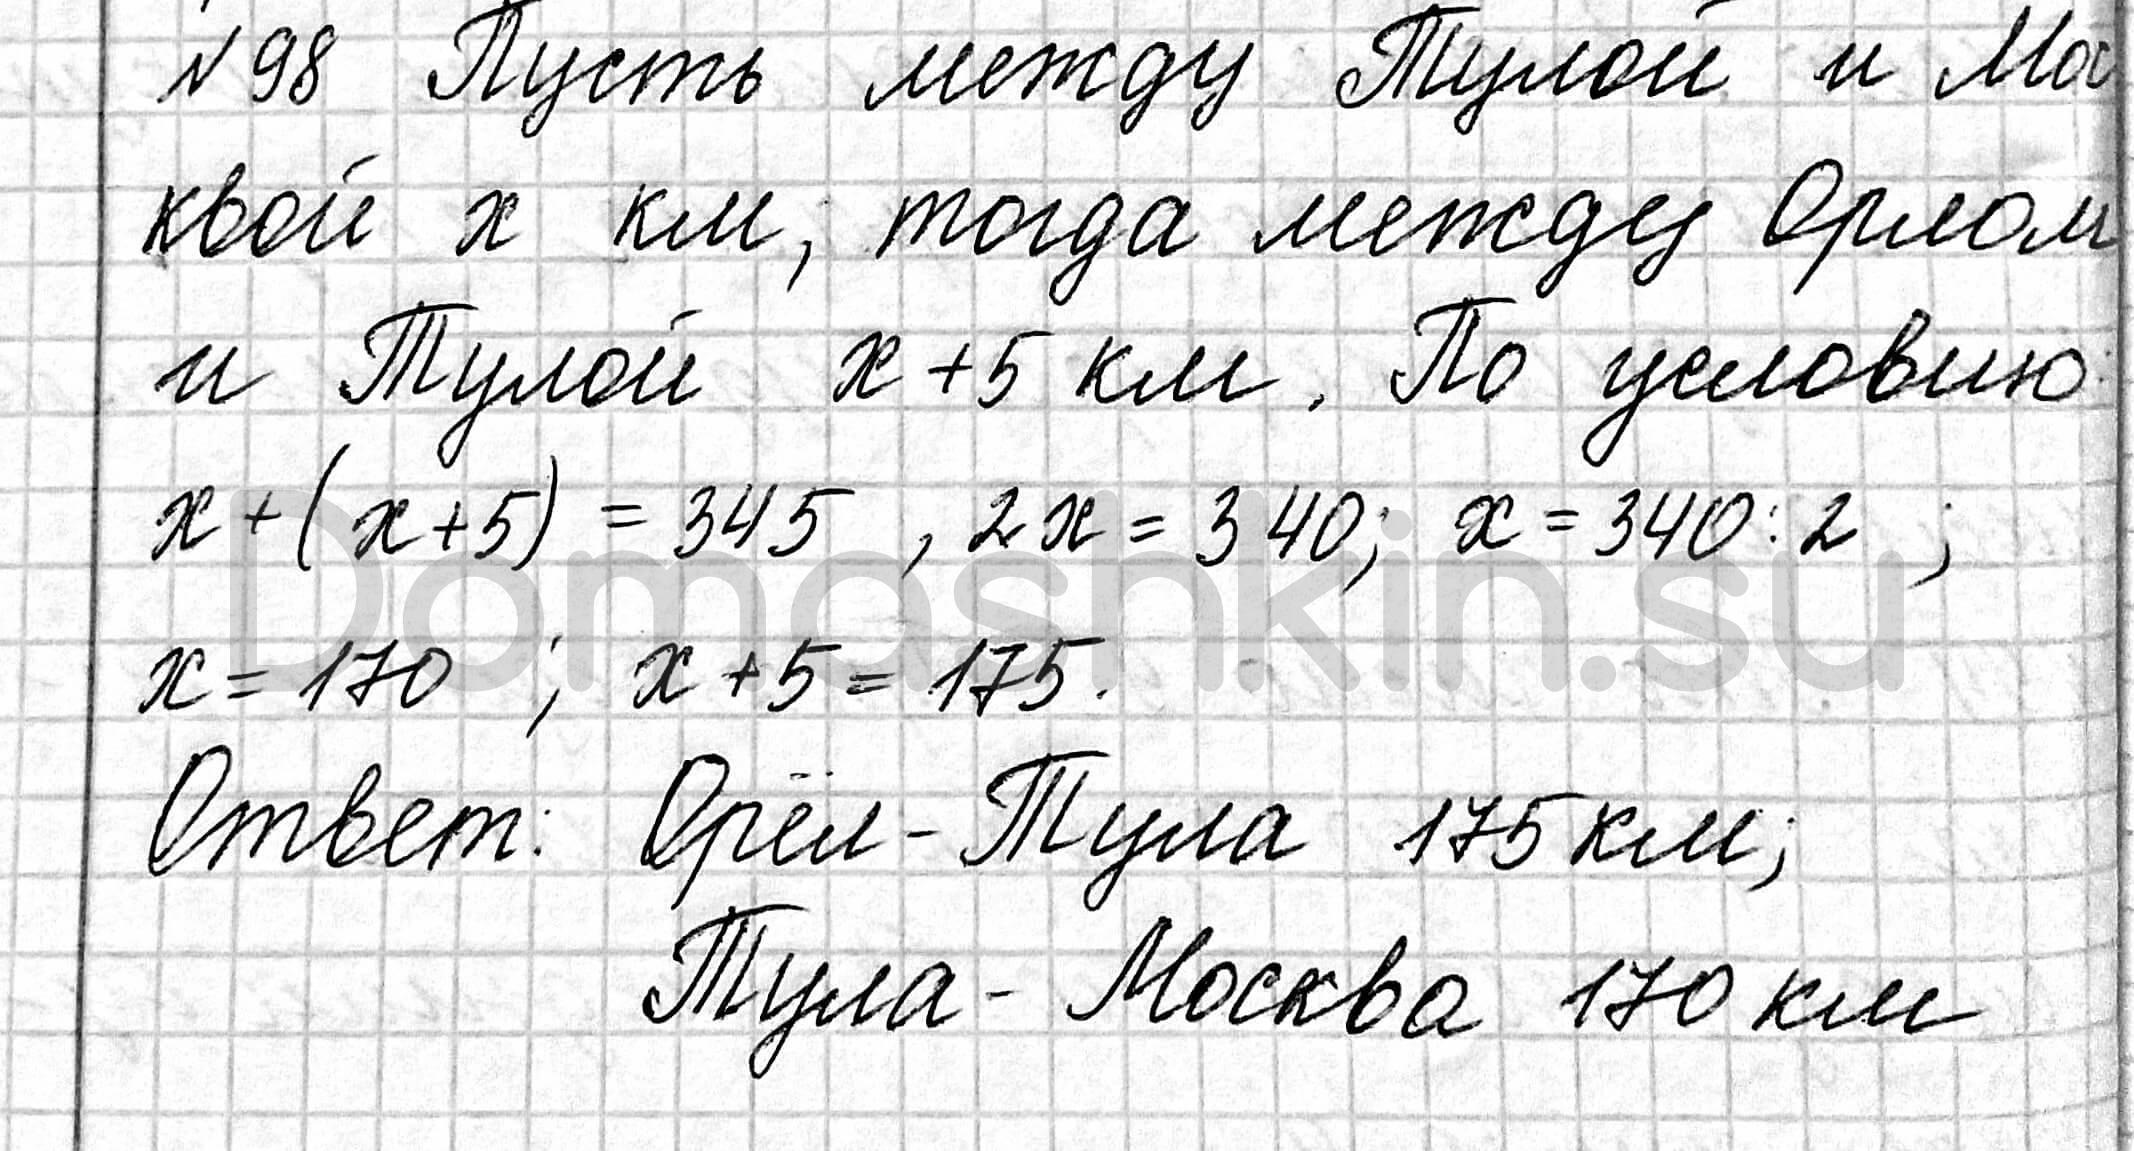 Математика 6 класс учебник Мерзляк номер 98 решение